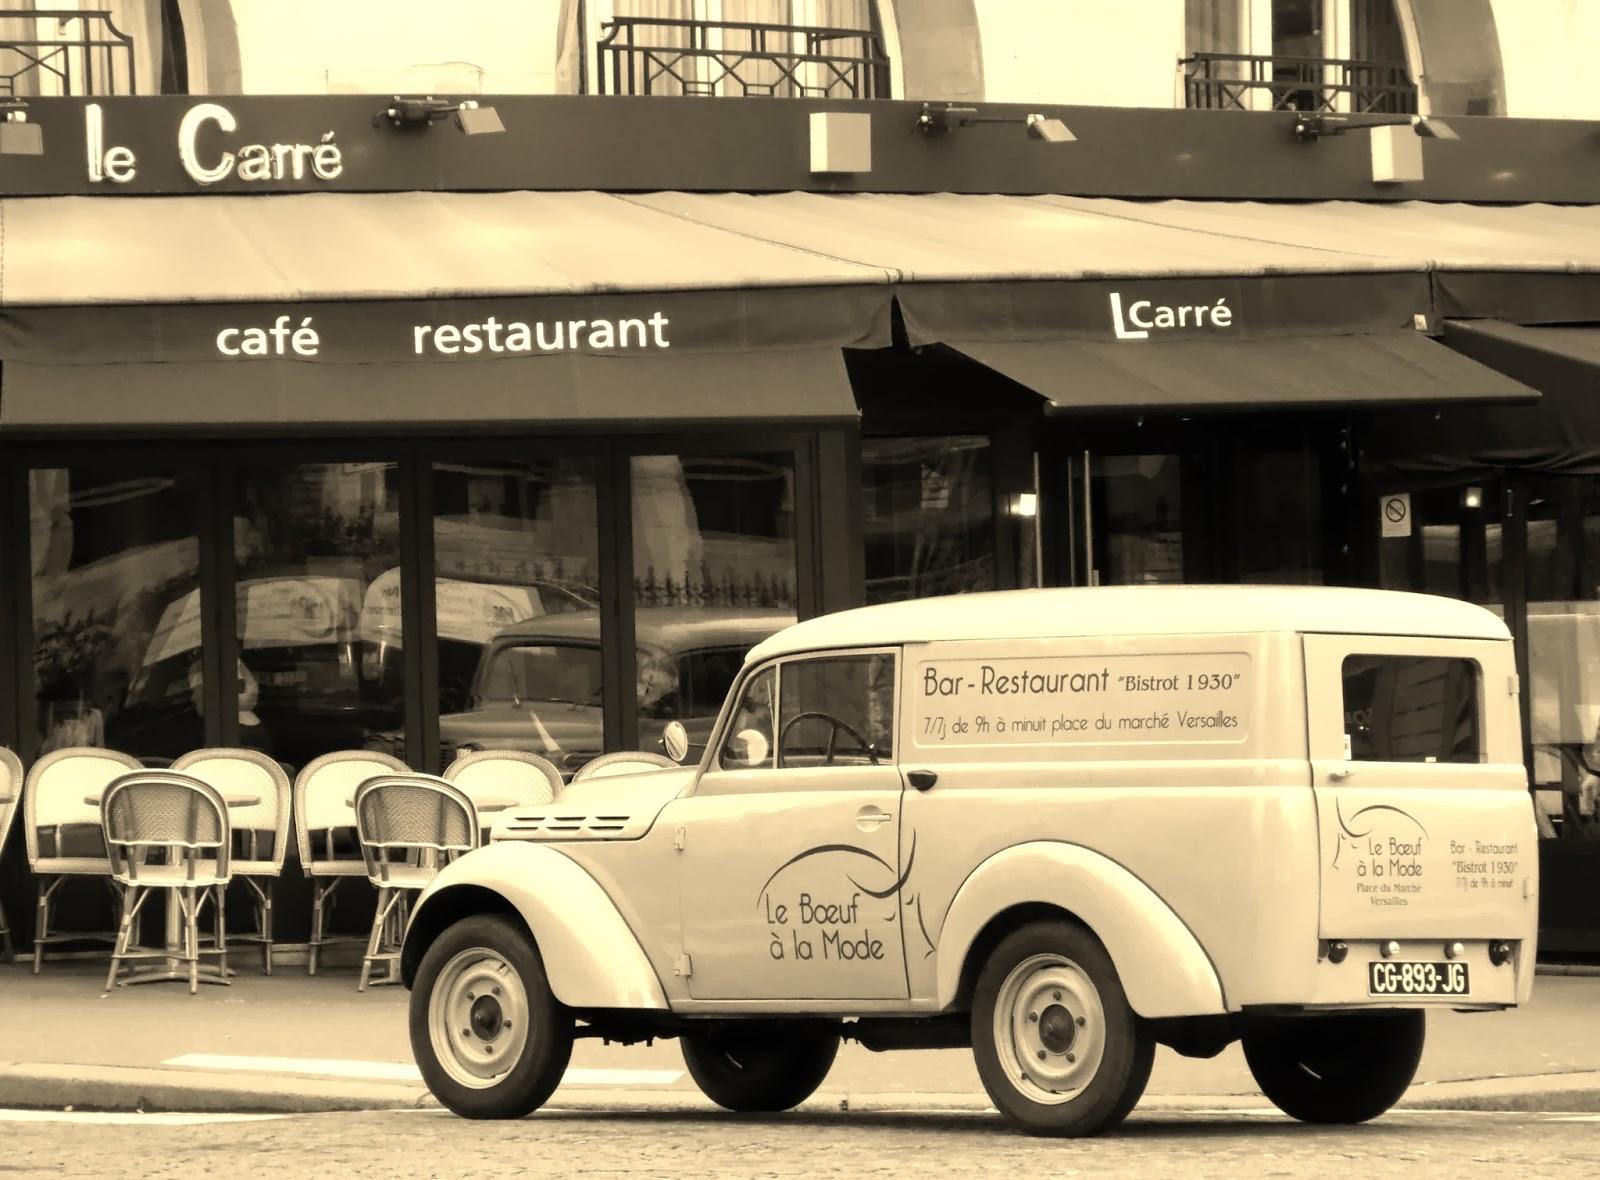 Van outside a cafe in Paris